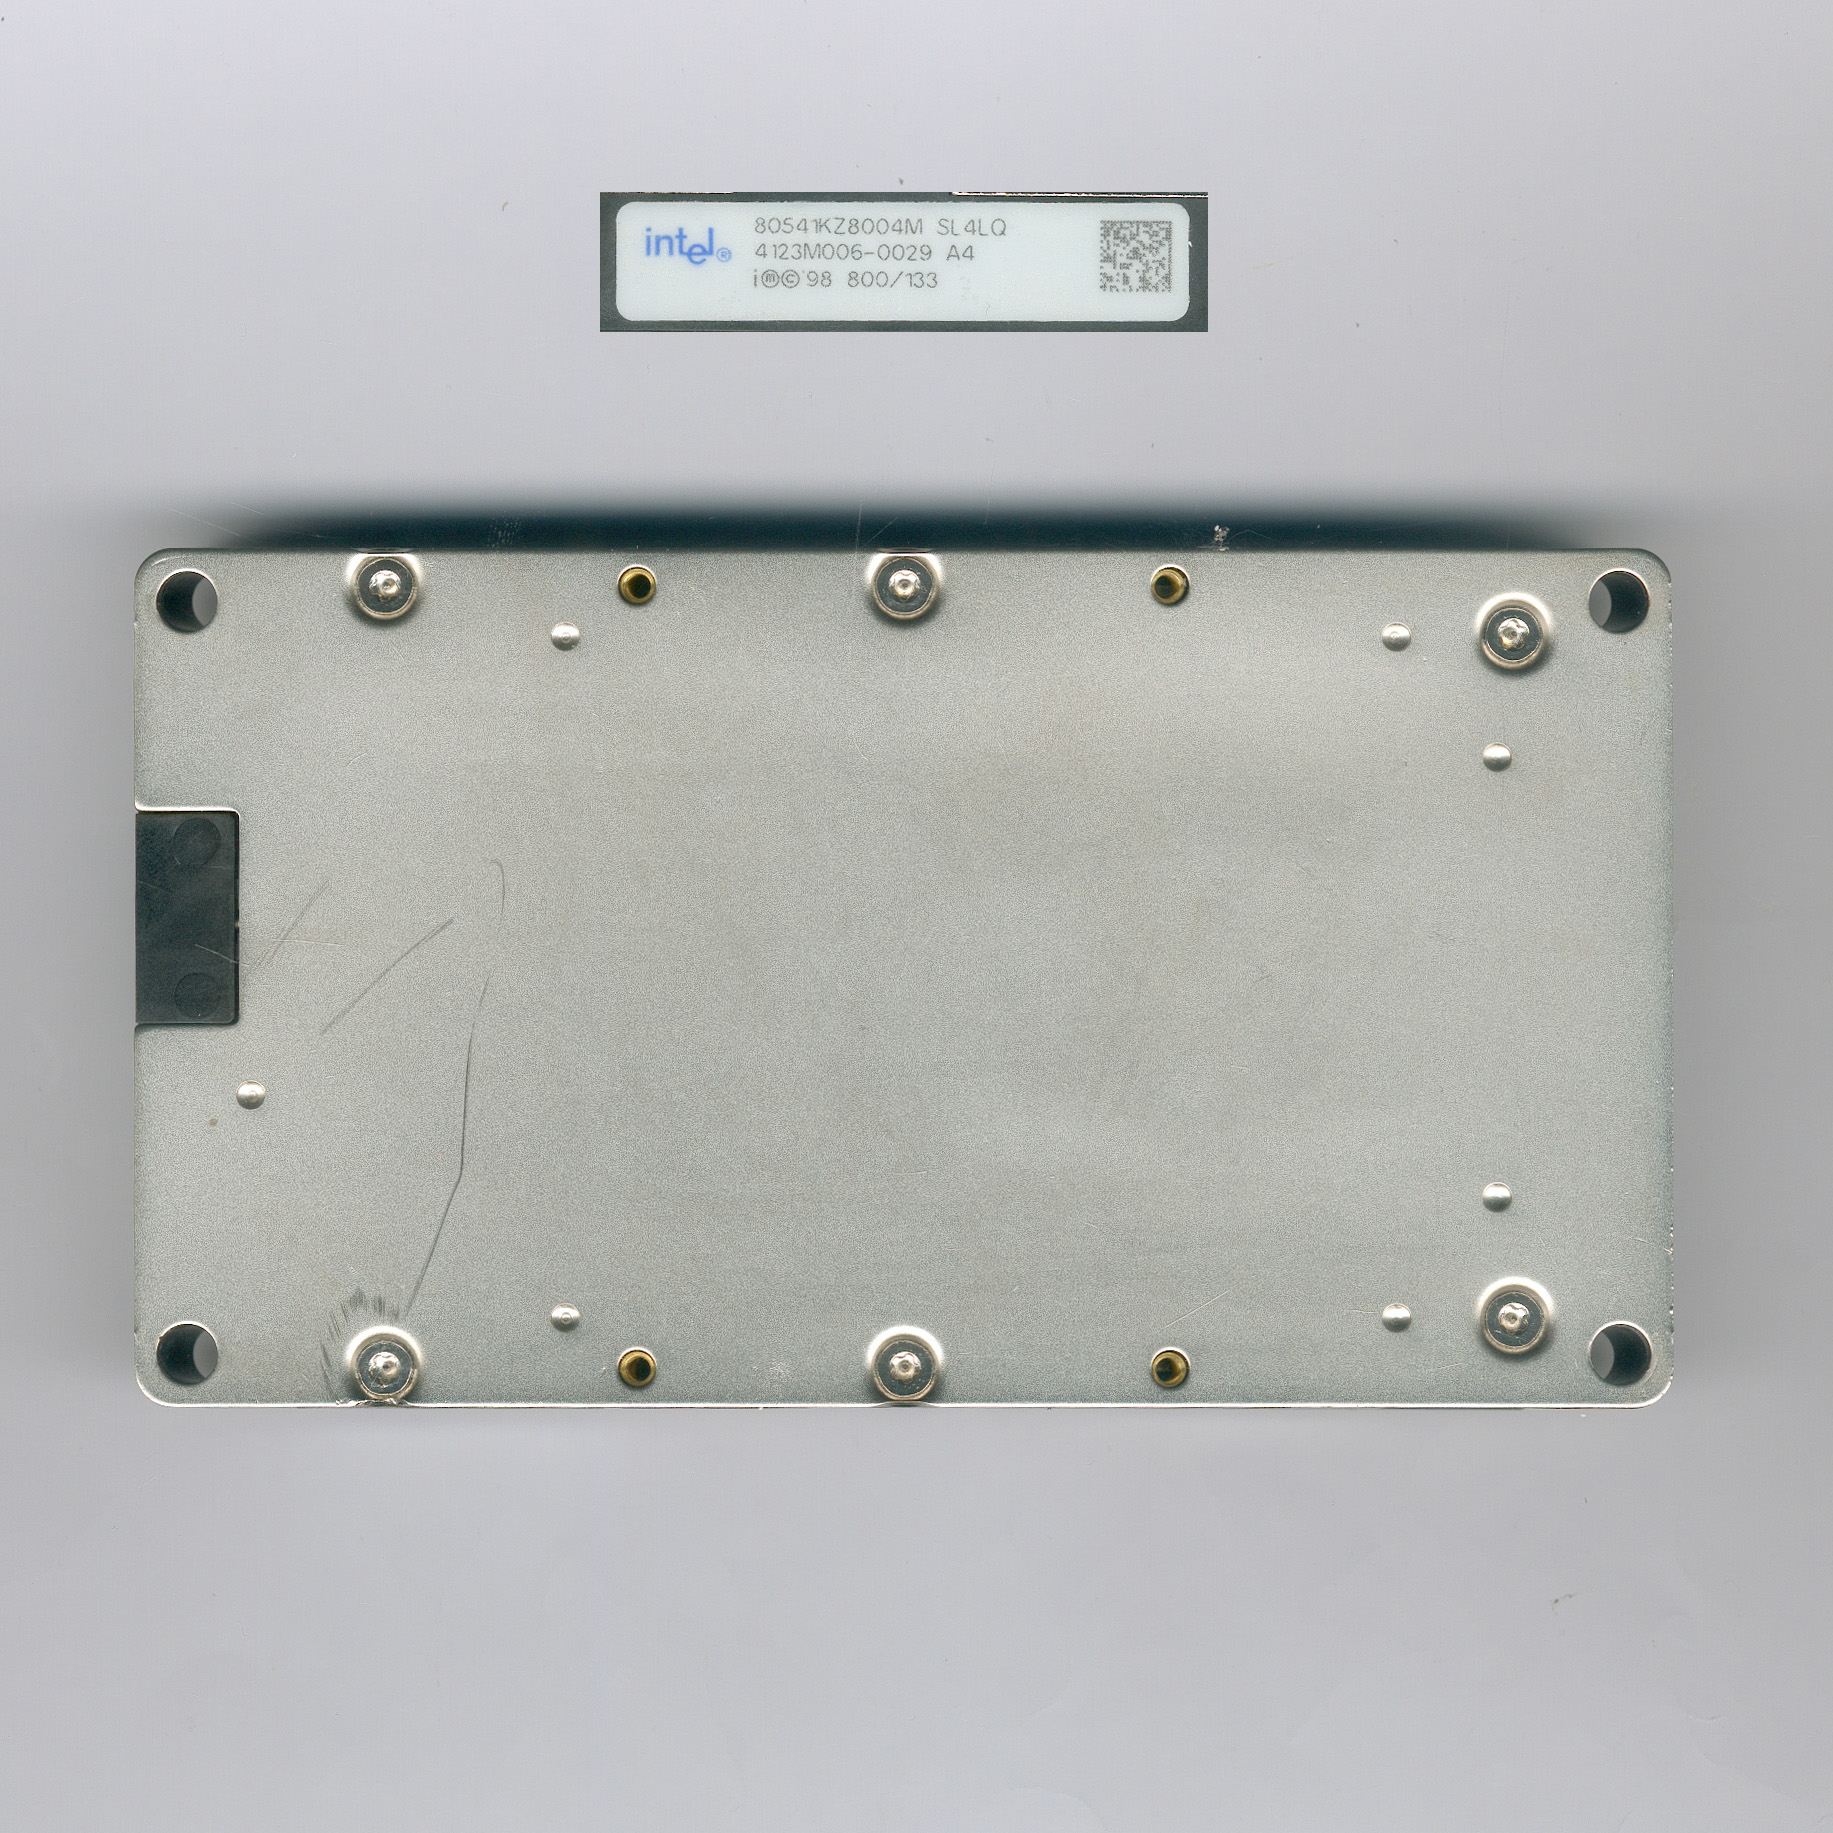 Intel_Itanium800_SL4LQ_F.jpg